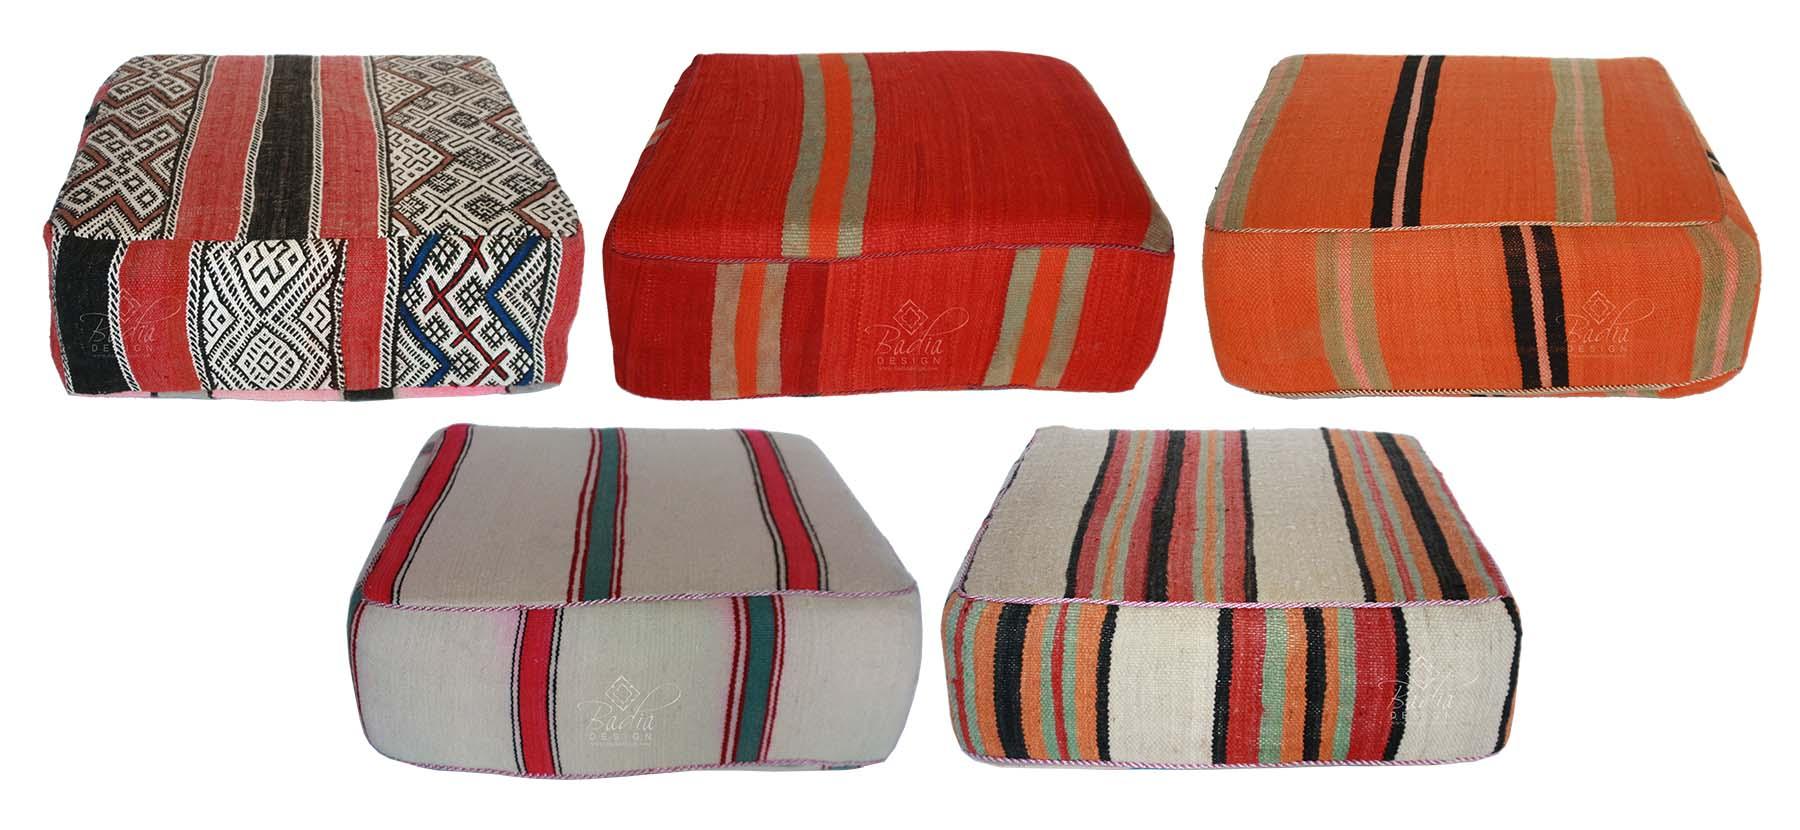 moroccan square shaped kilim floor cushion from badia design inc